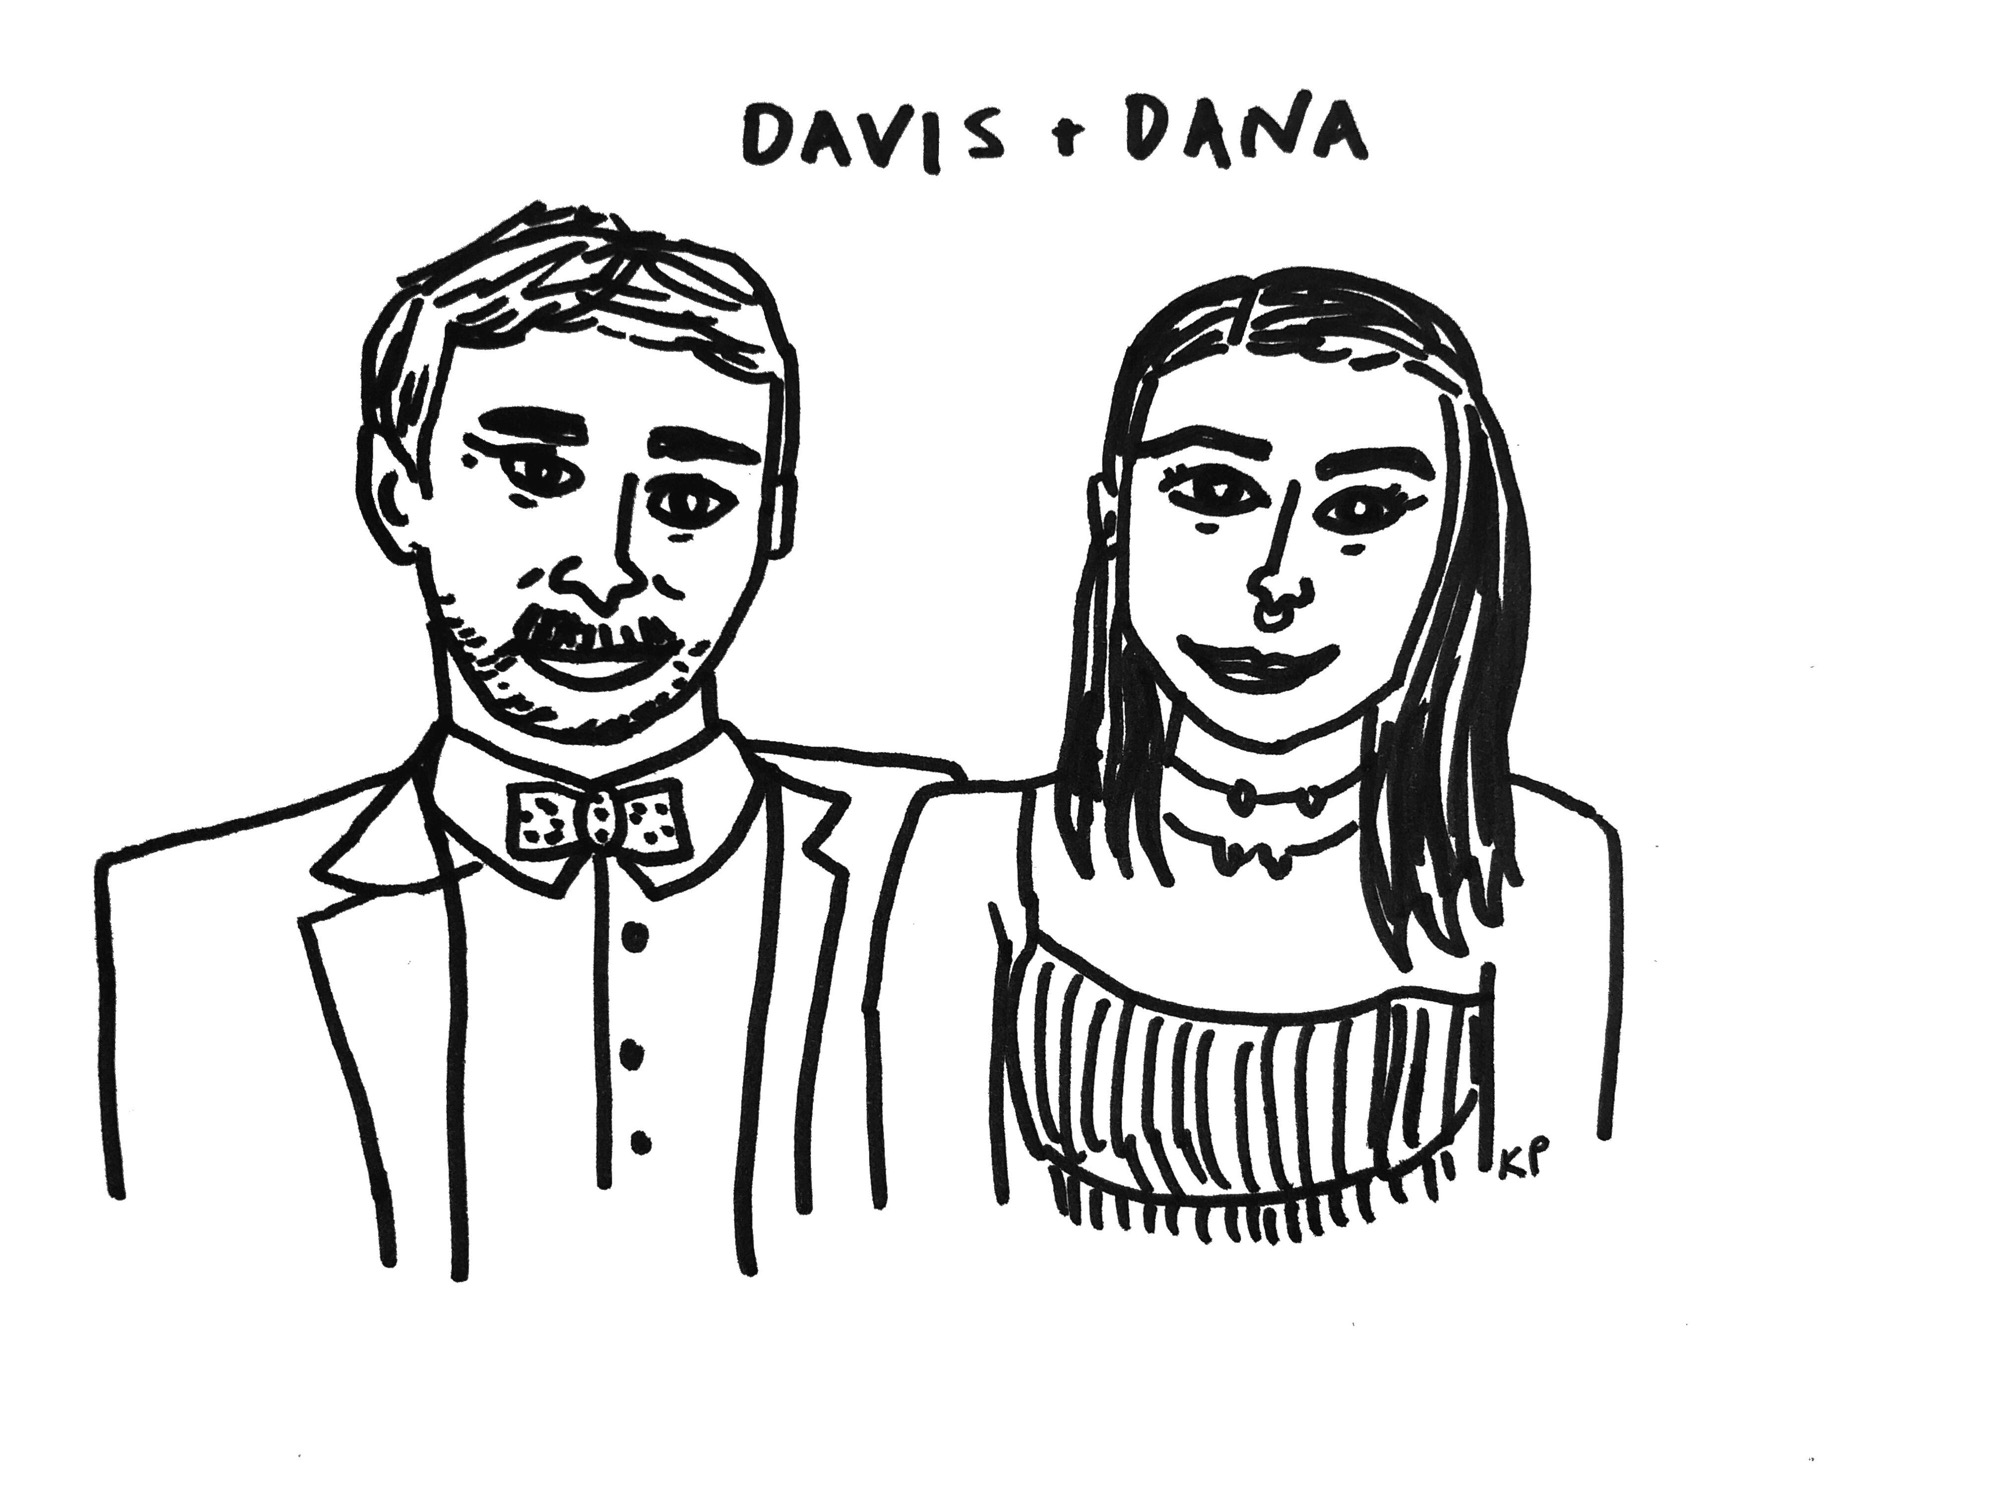 Davis + Dana.JPEG